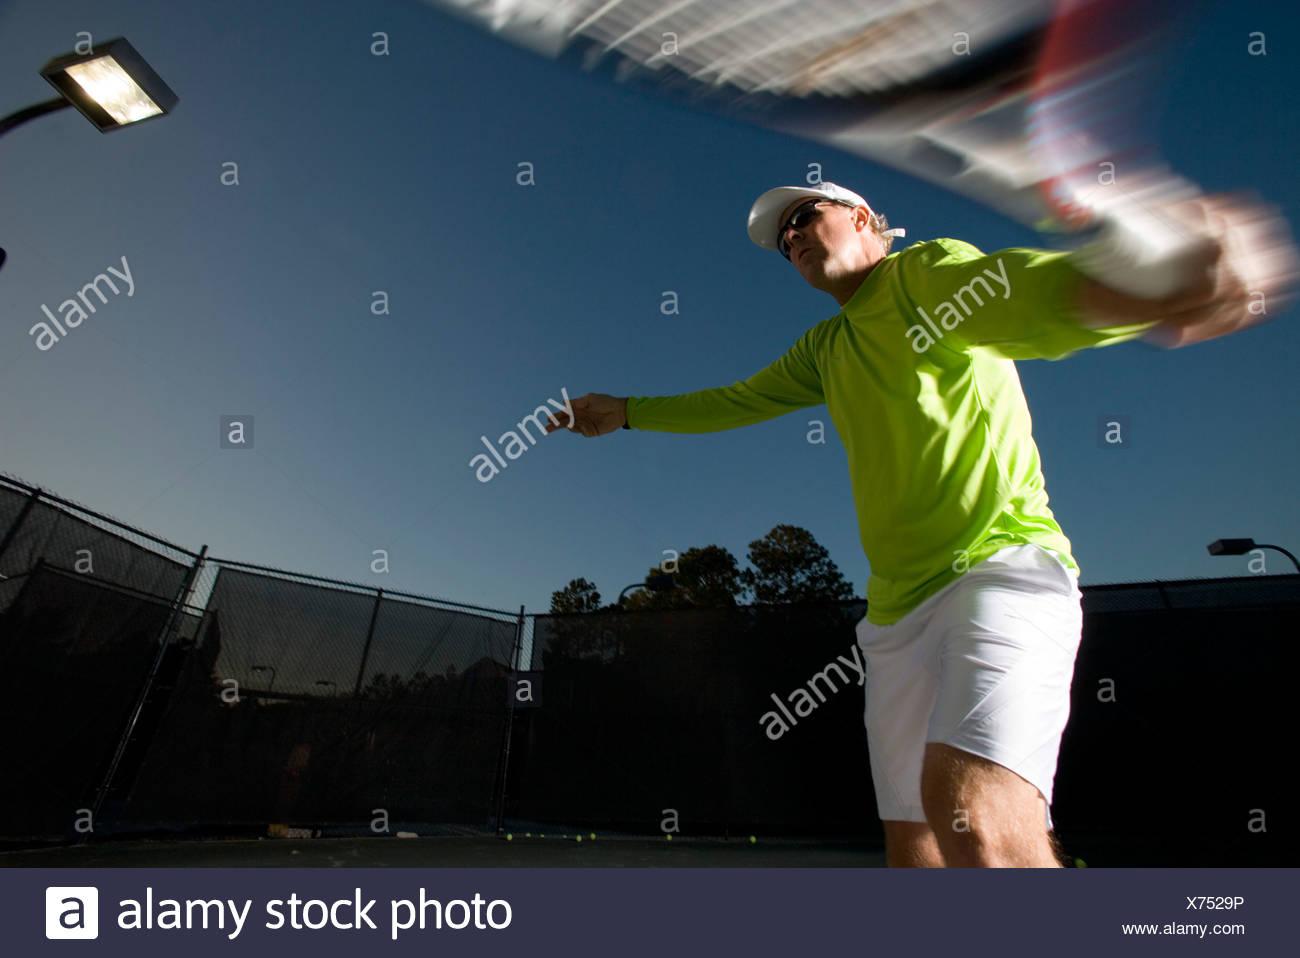 Tennis player hitting a backhand - Stock Image